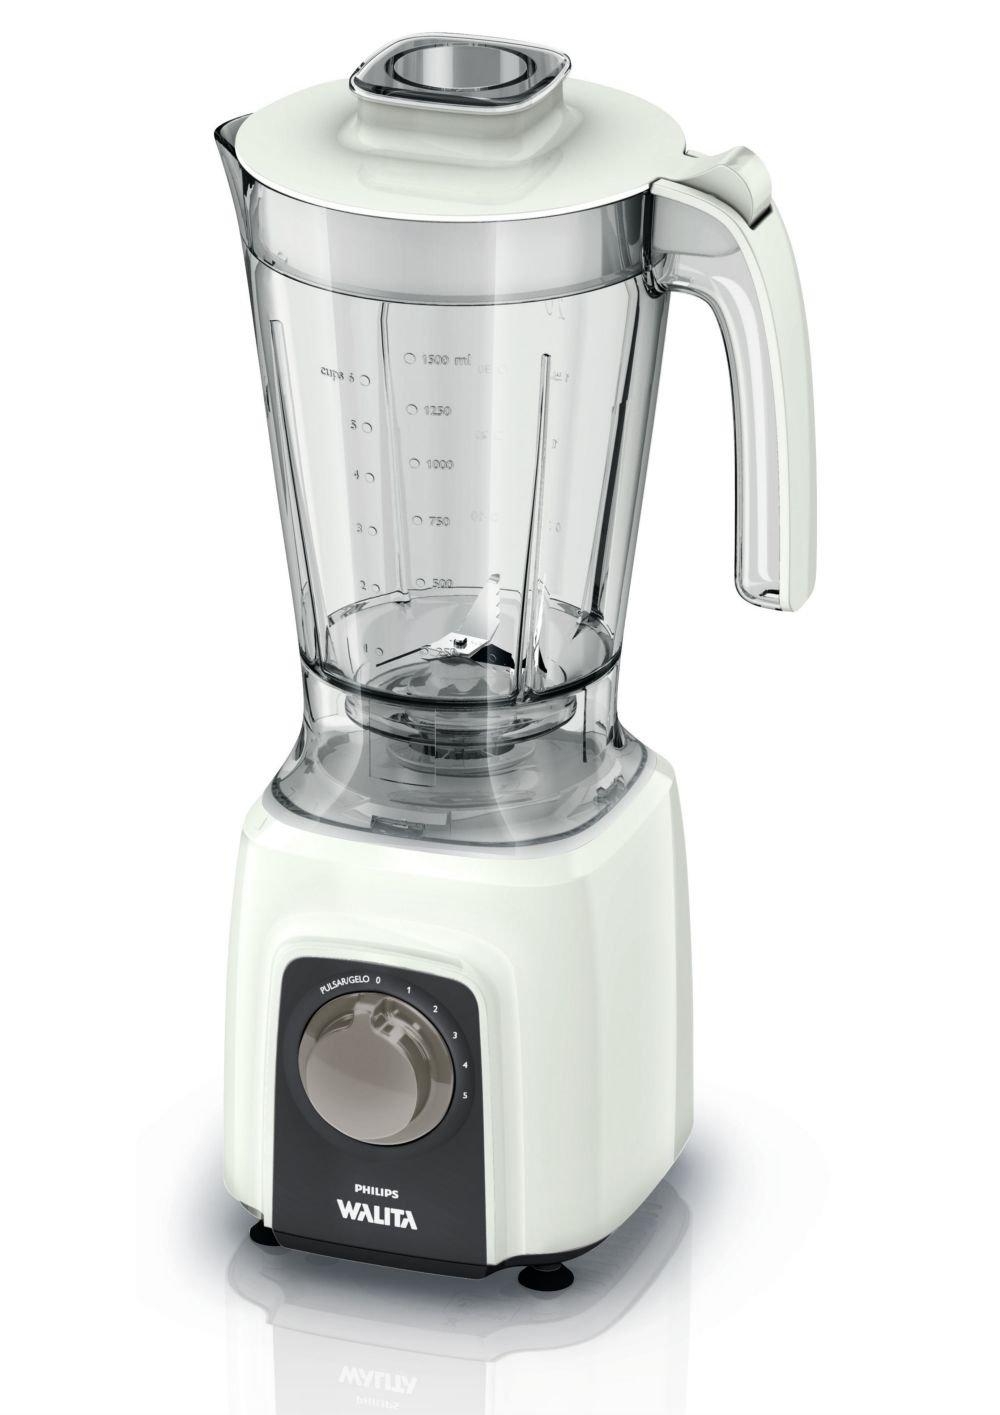 Philips Walita RI2160/00 - Licuadora (2 L, Batidora de vaso ...